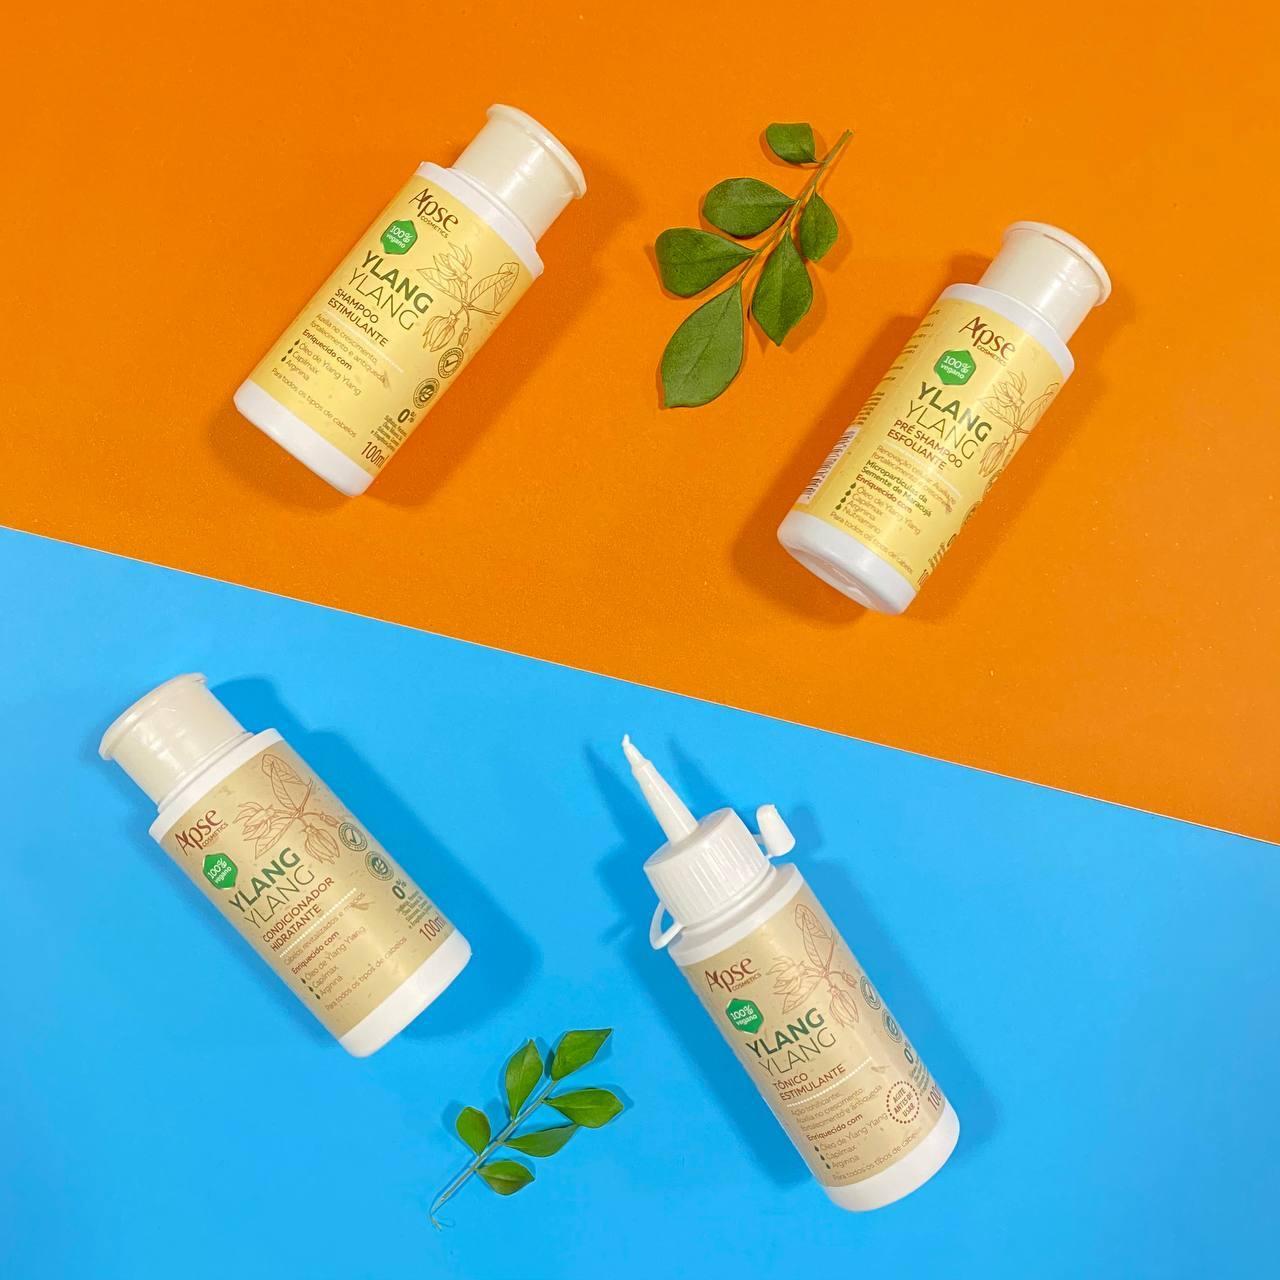 Kit Viagem Ylang Ylang (4 ITENS) - Apse Cosmetics